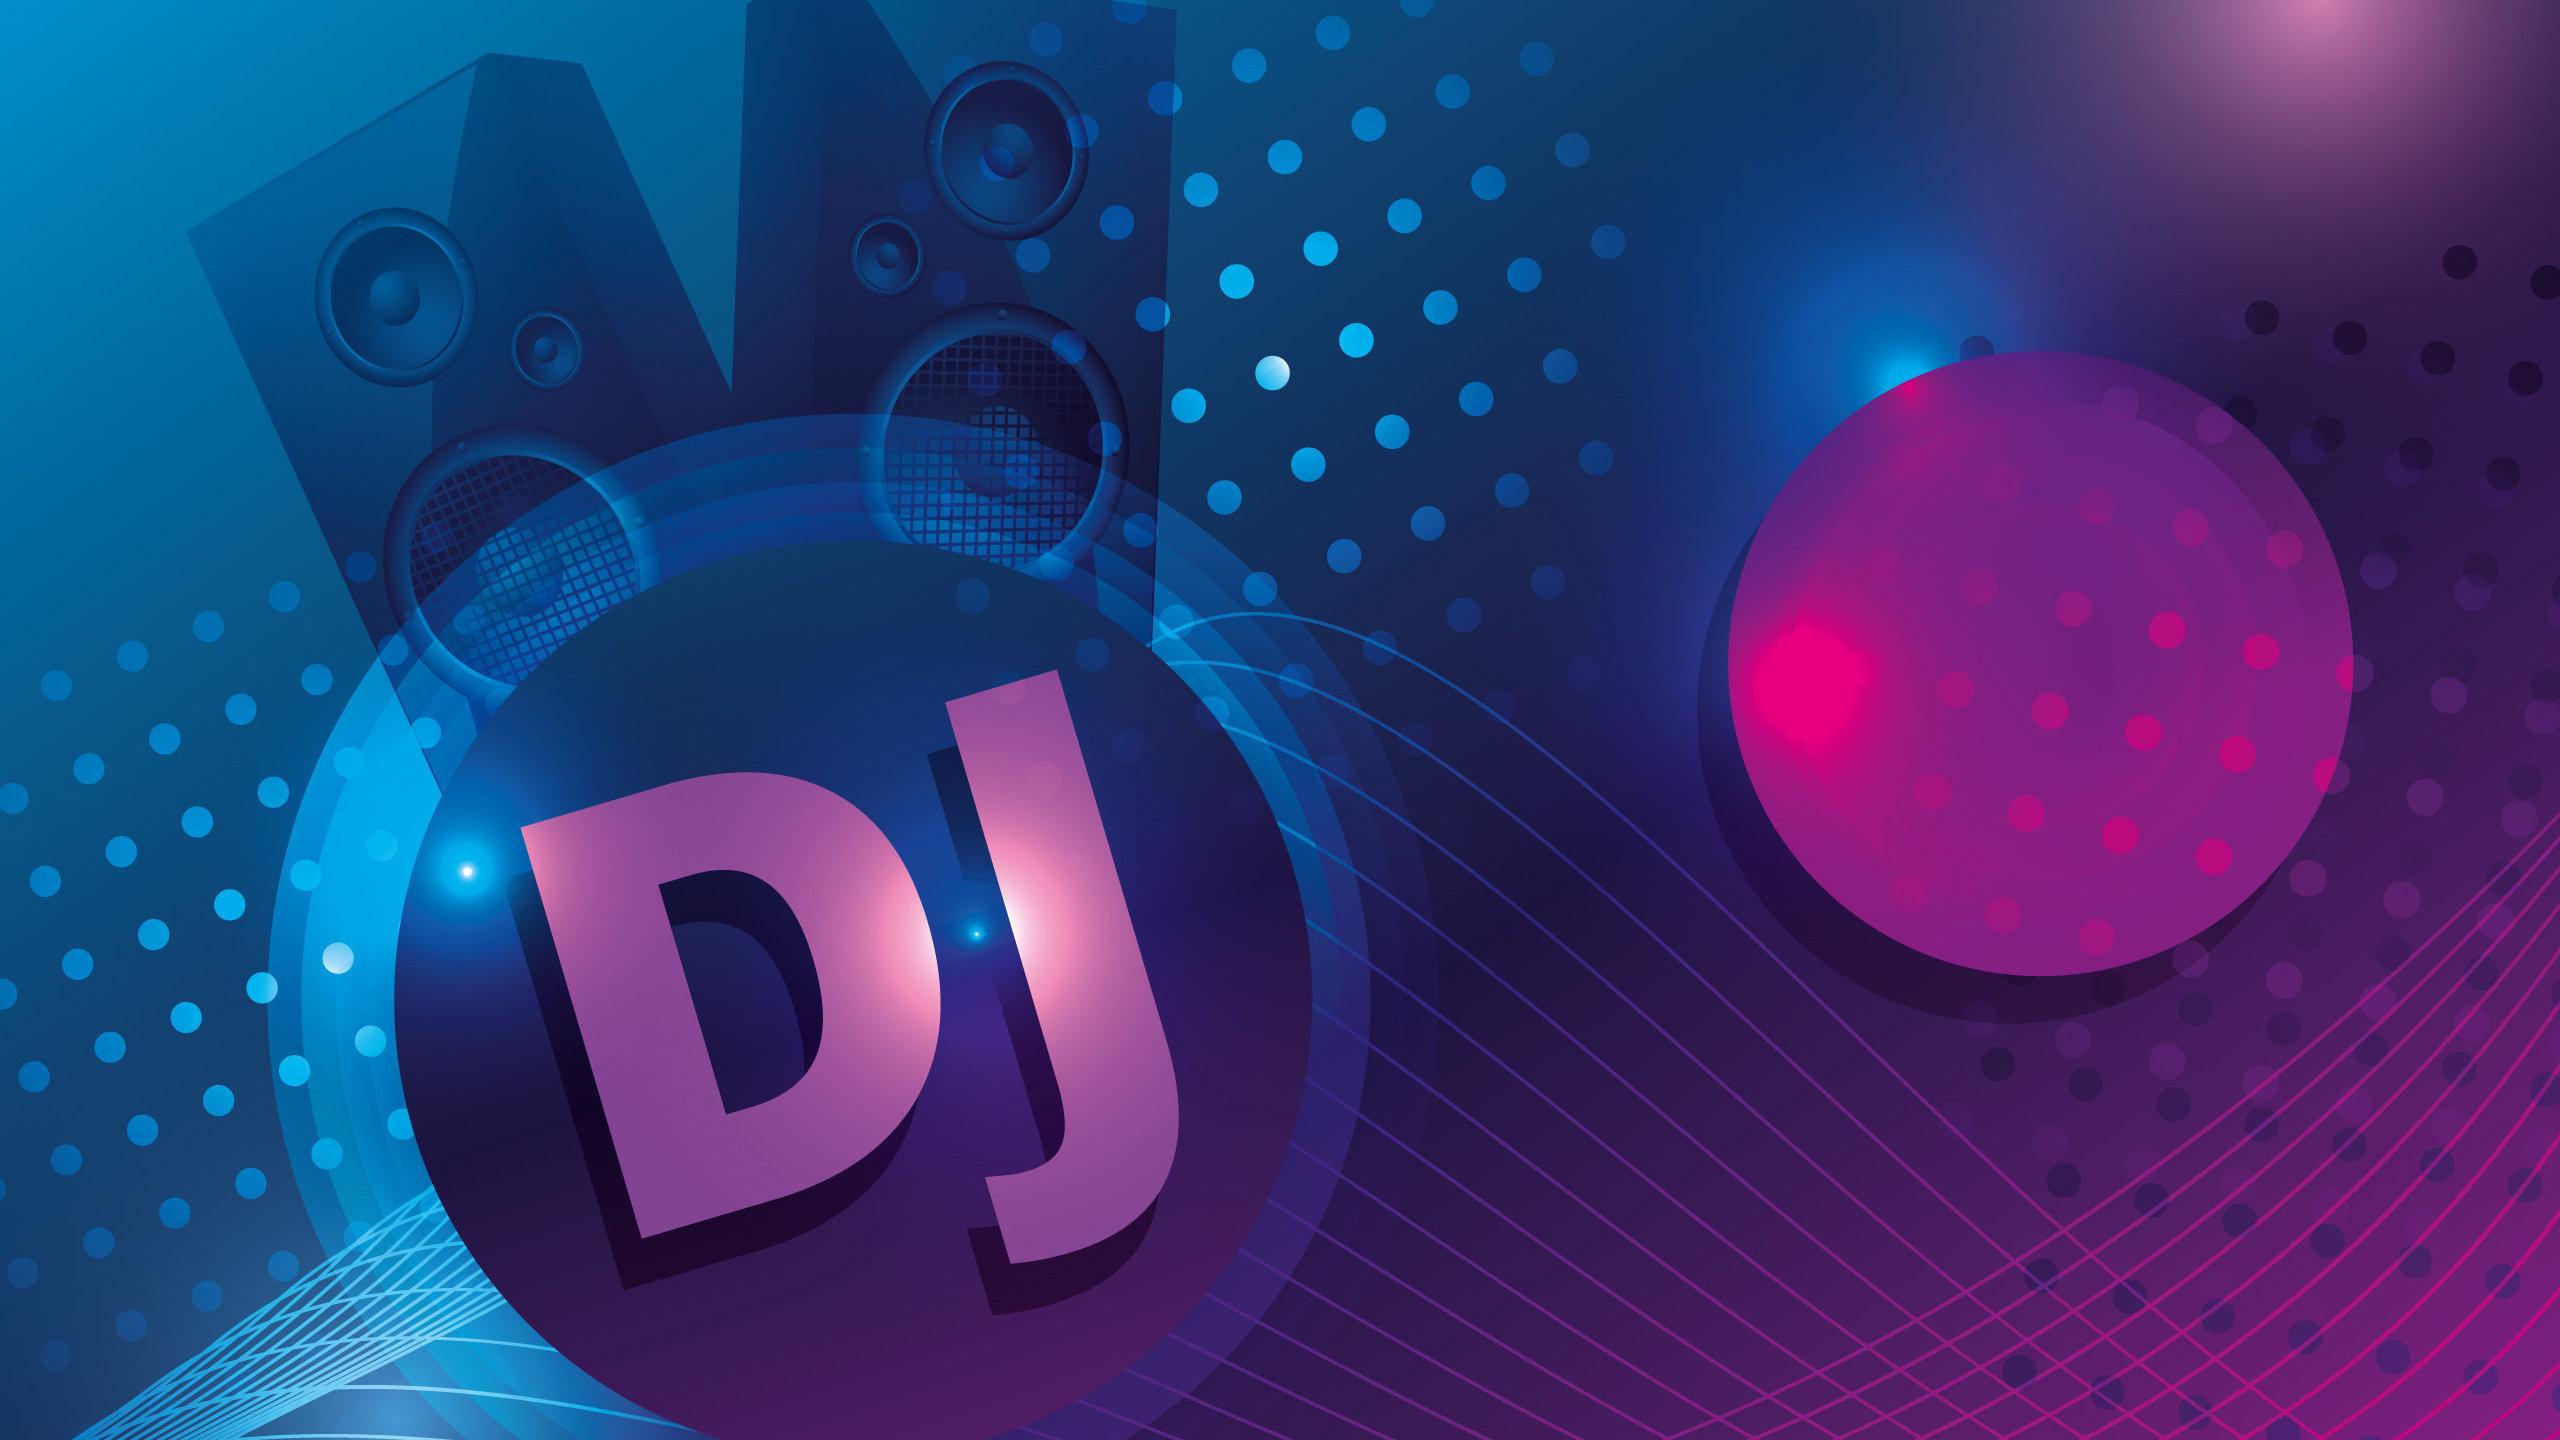 Dj Hd Wallpapers 2015: DJ And Speakers Wallpaper